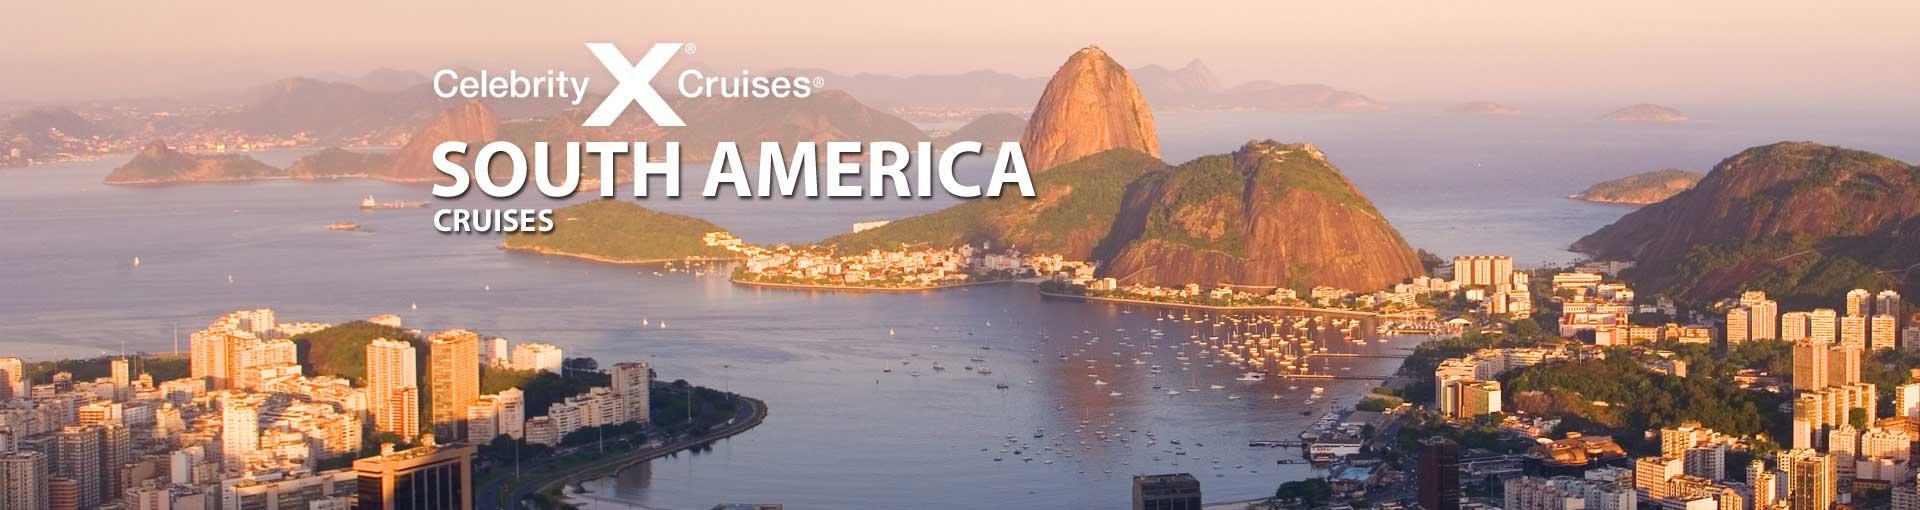 Celebrity Cruises South America Cruises